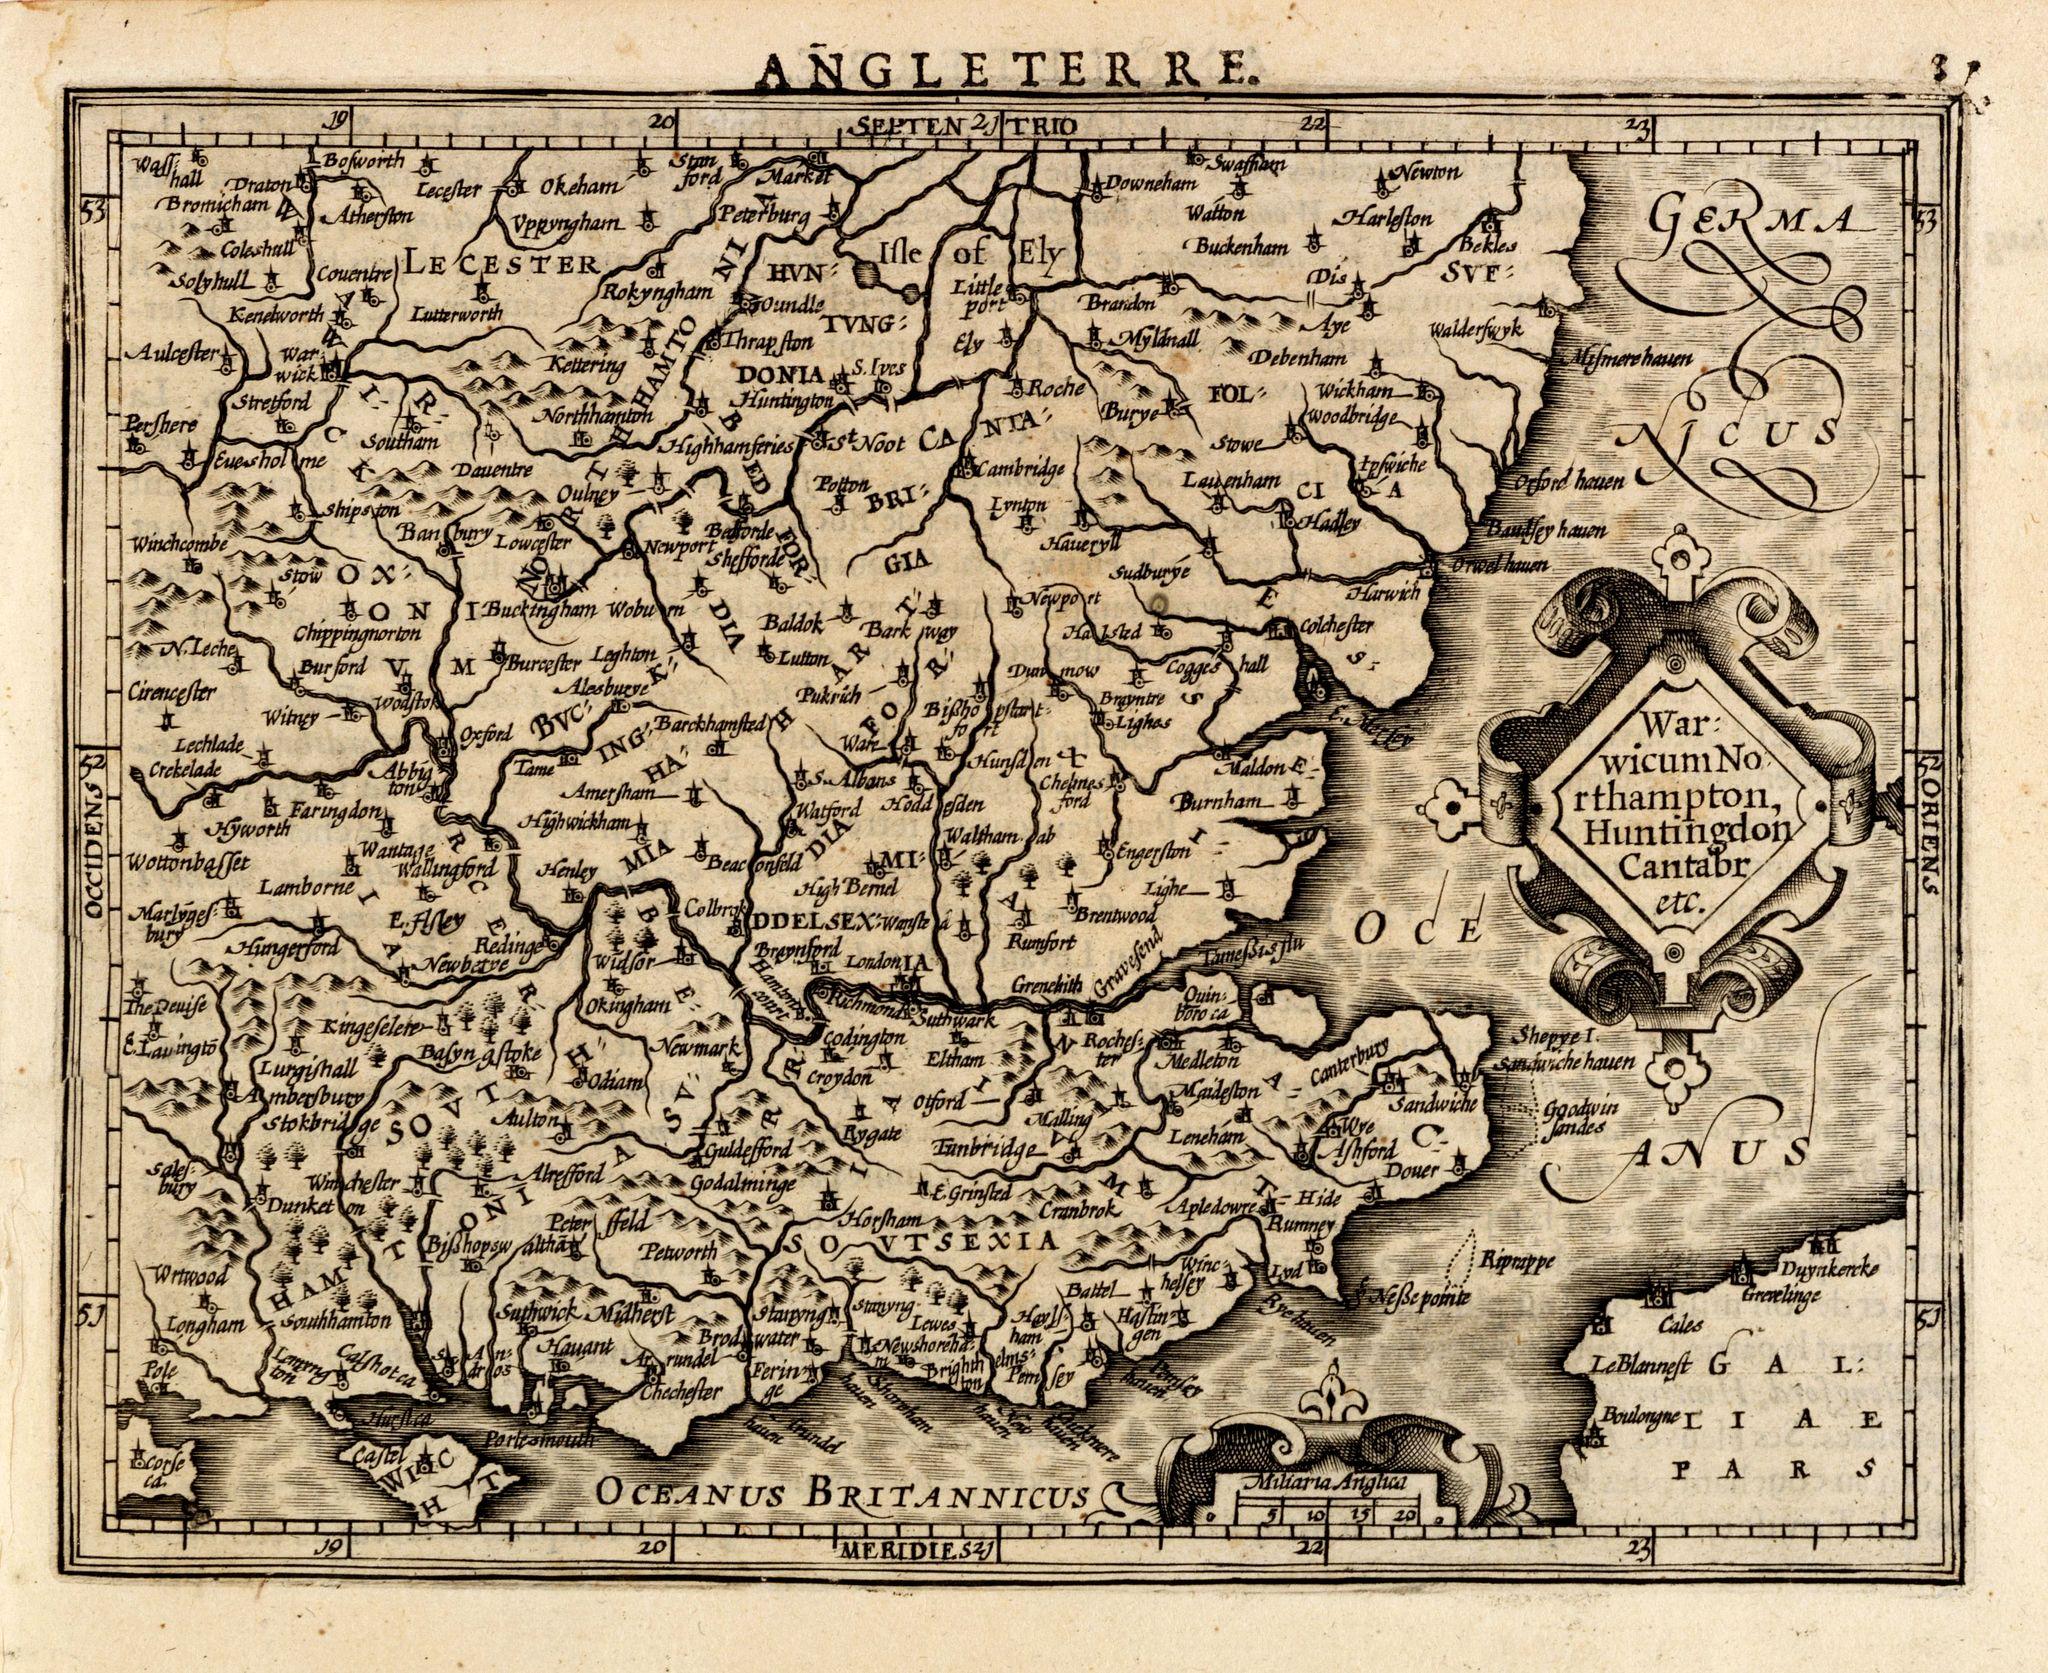 MERCATOR,G./ HONDIUS,J. -  Warwicum Northampton, Huntingdon Cantabr etc.